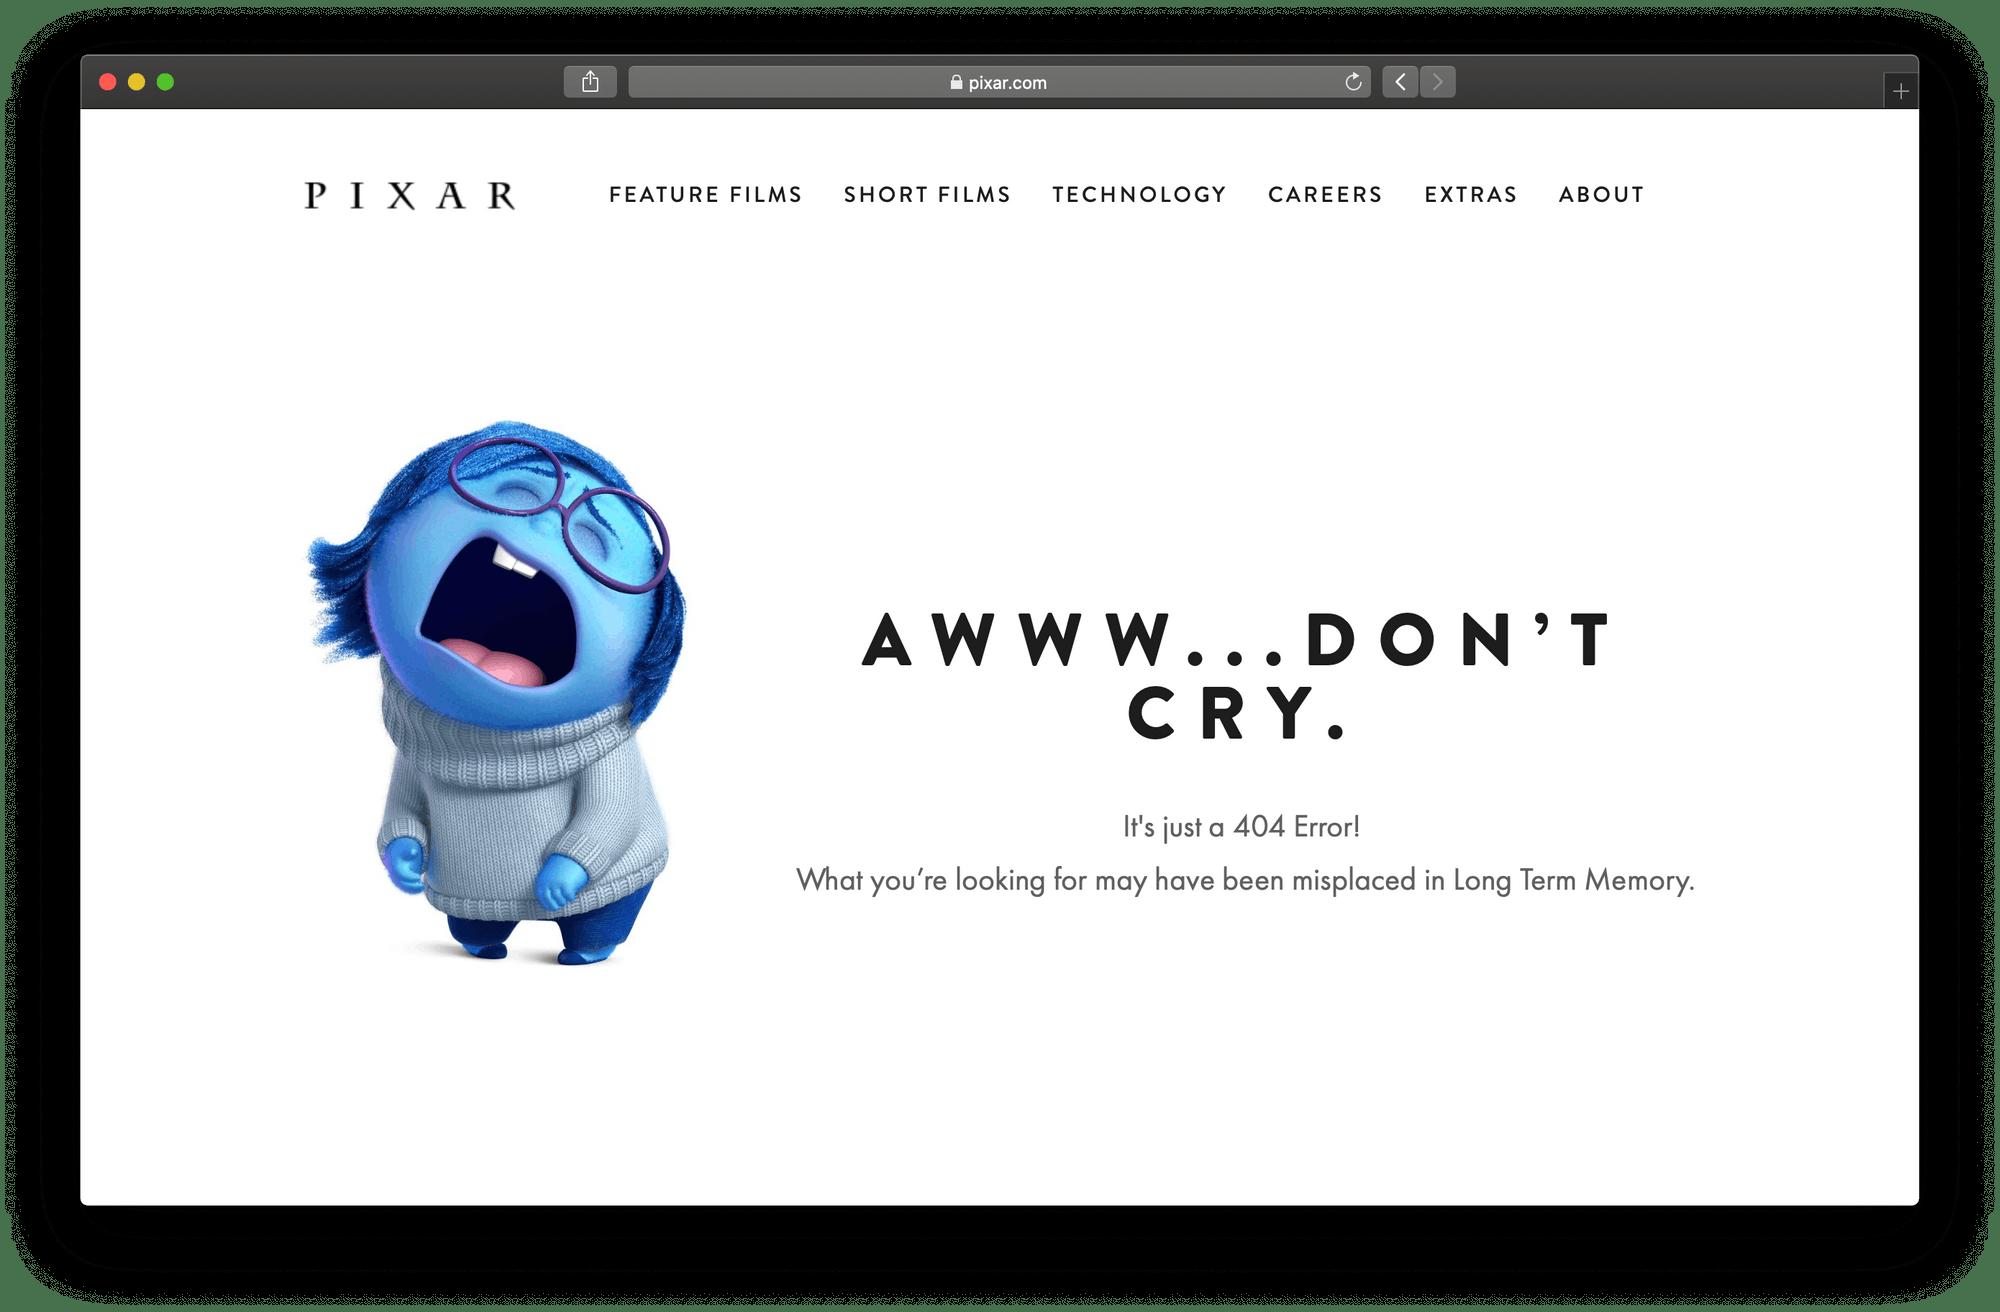 Pixar's 404 page